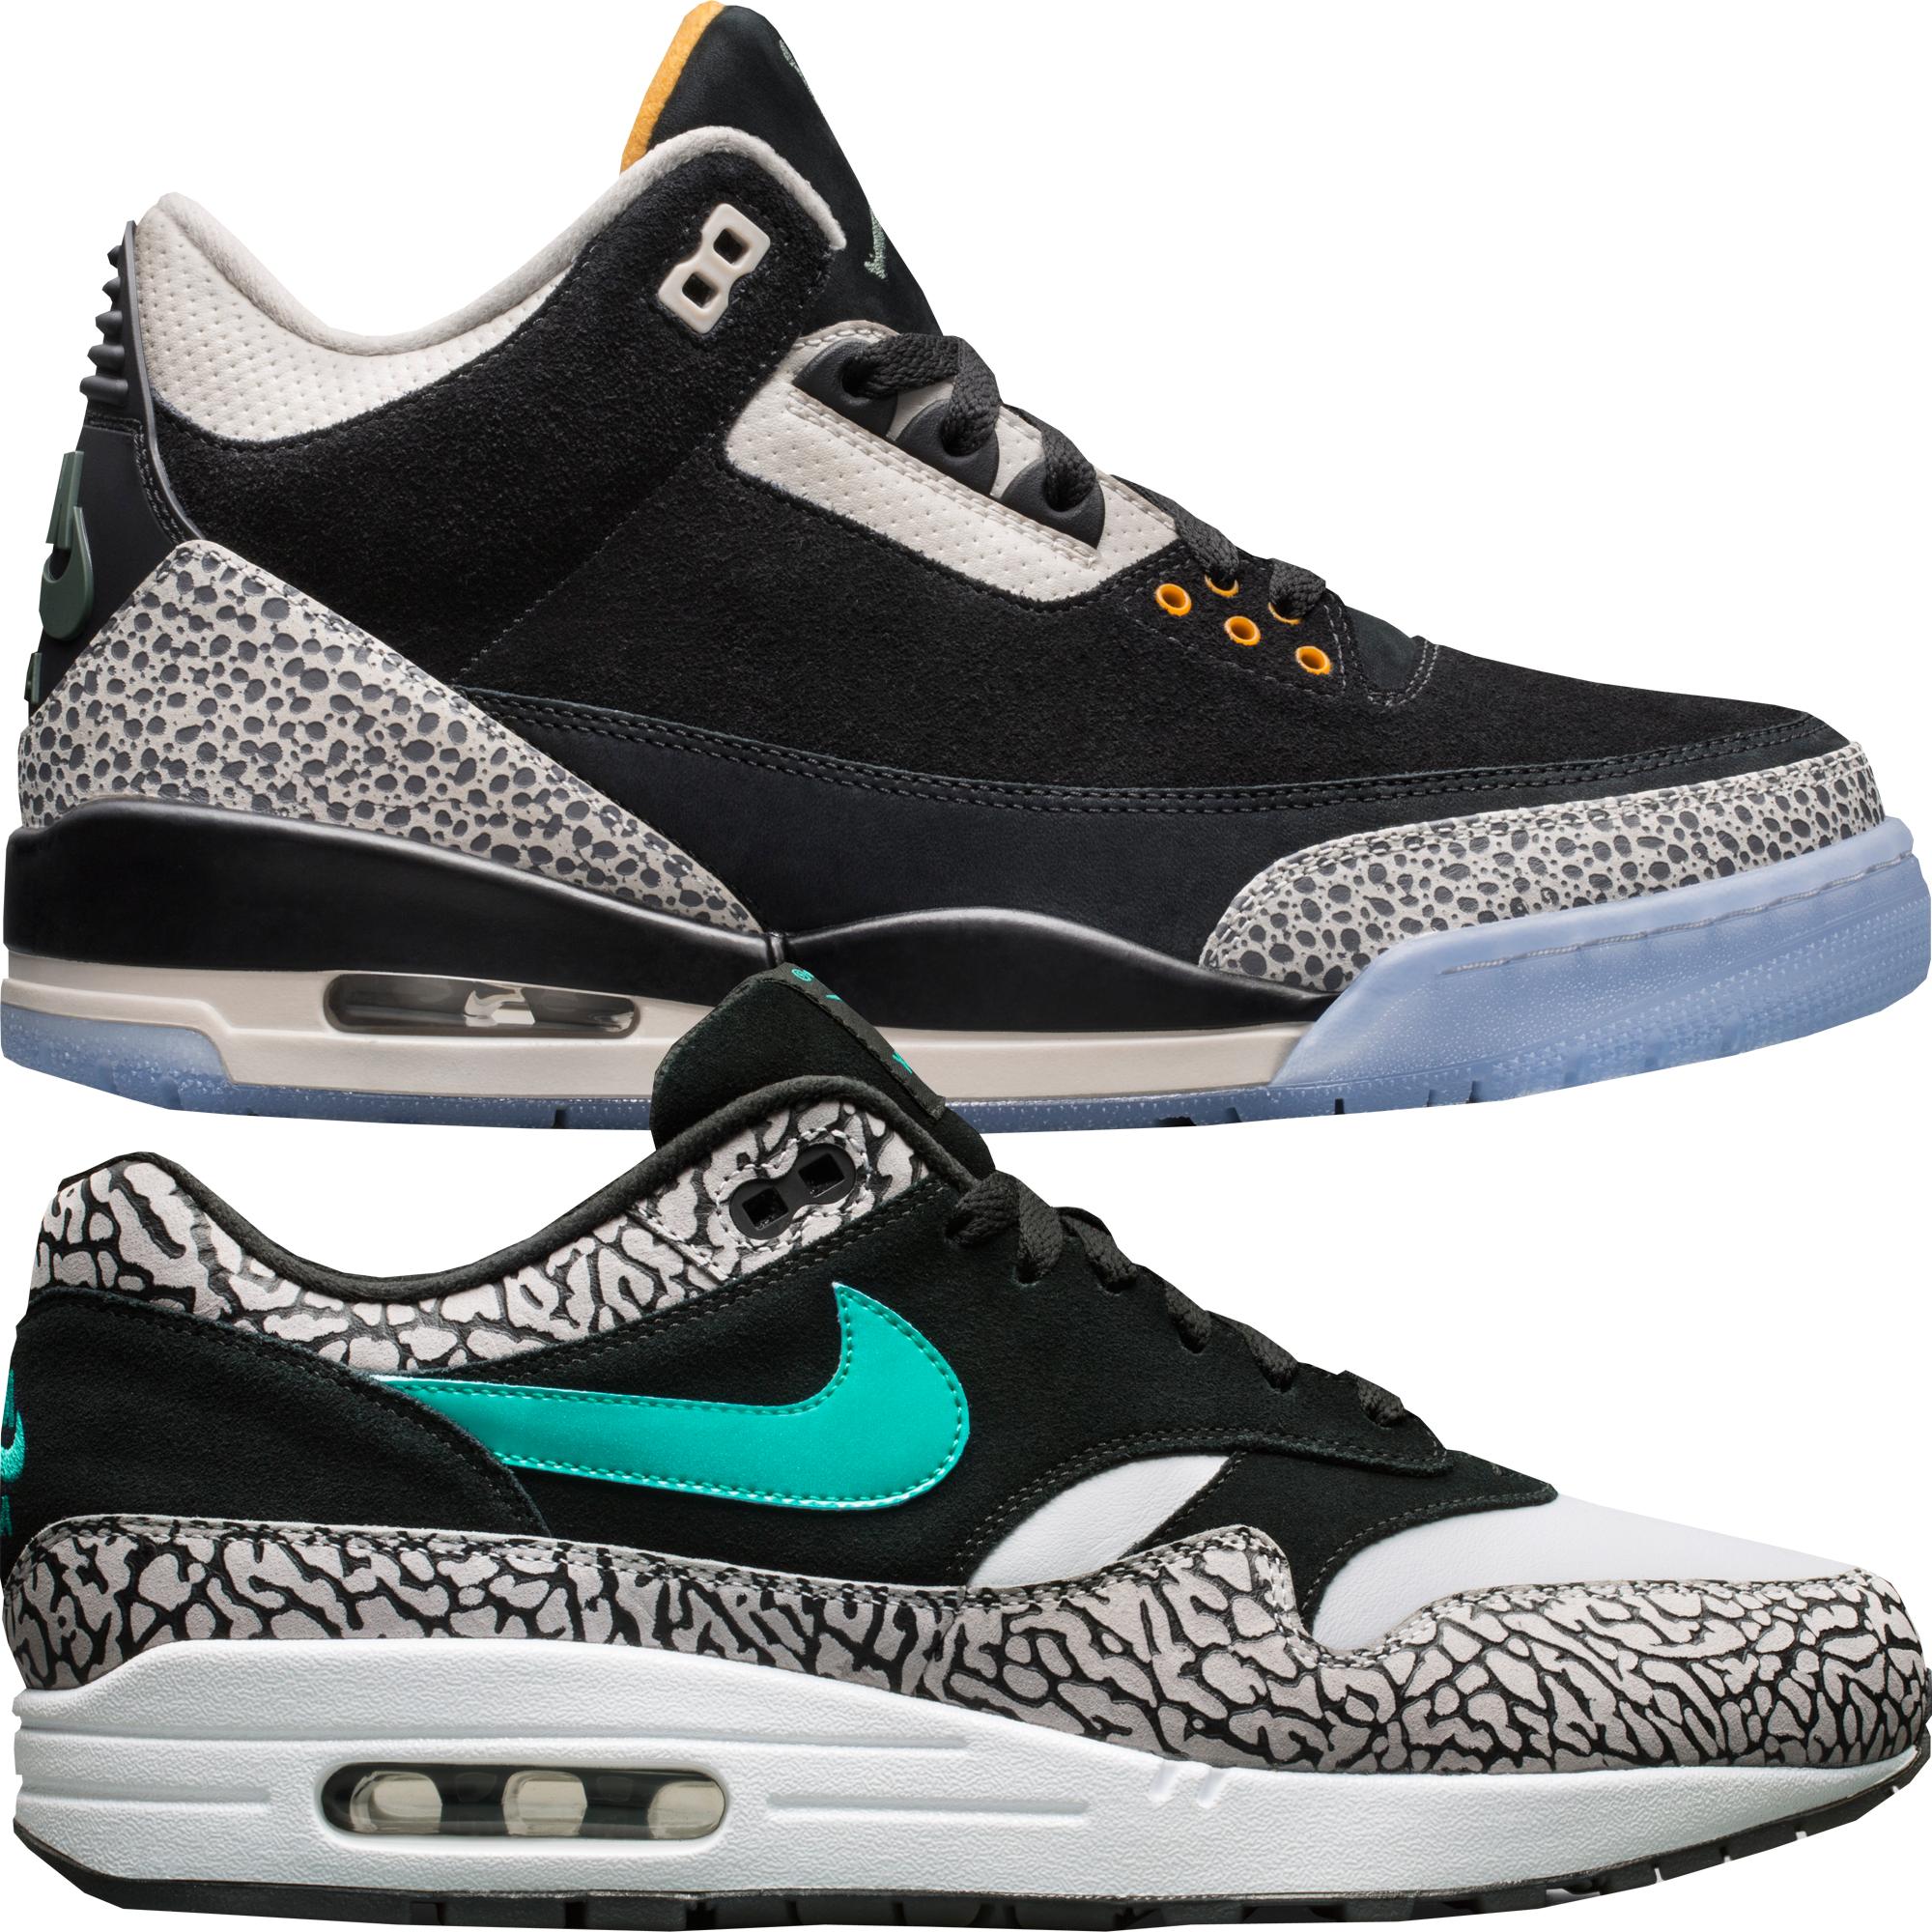 Air Jordan x Max Pack - StockX News